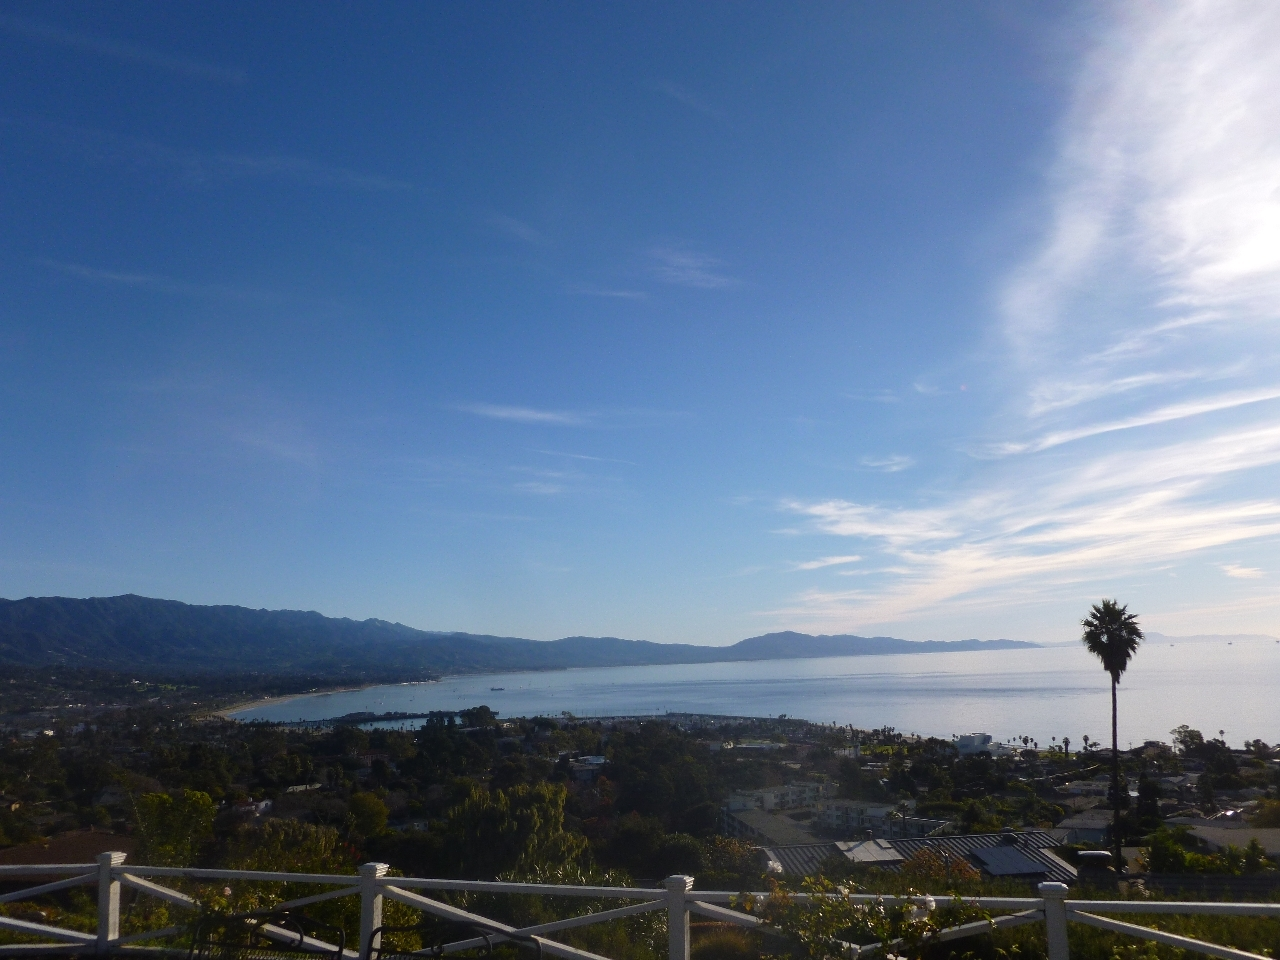 Property photo for 1129 Harbor Hills Dr Santa Barbara, California 93109 - 13-186